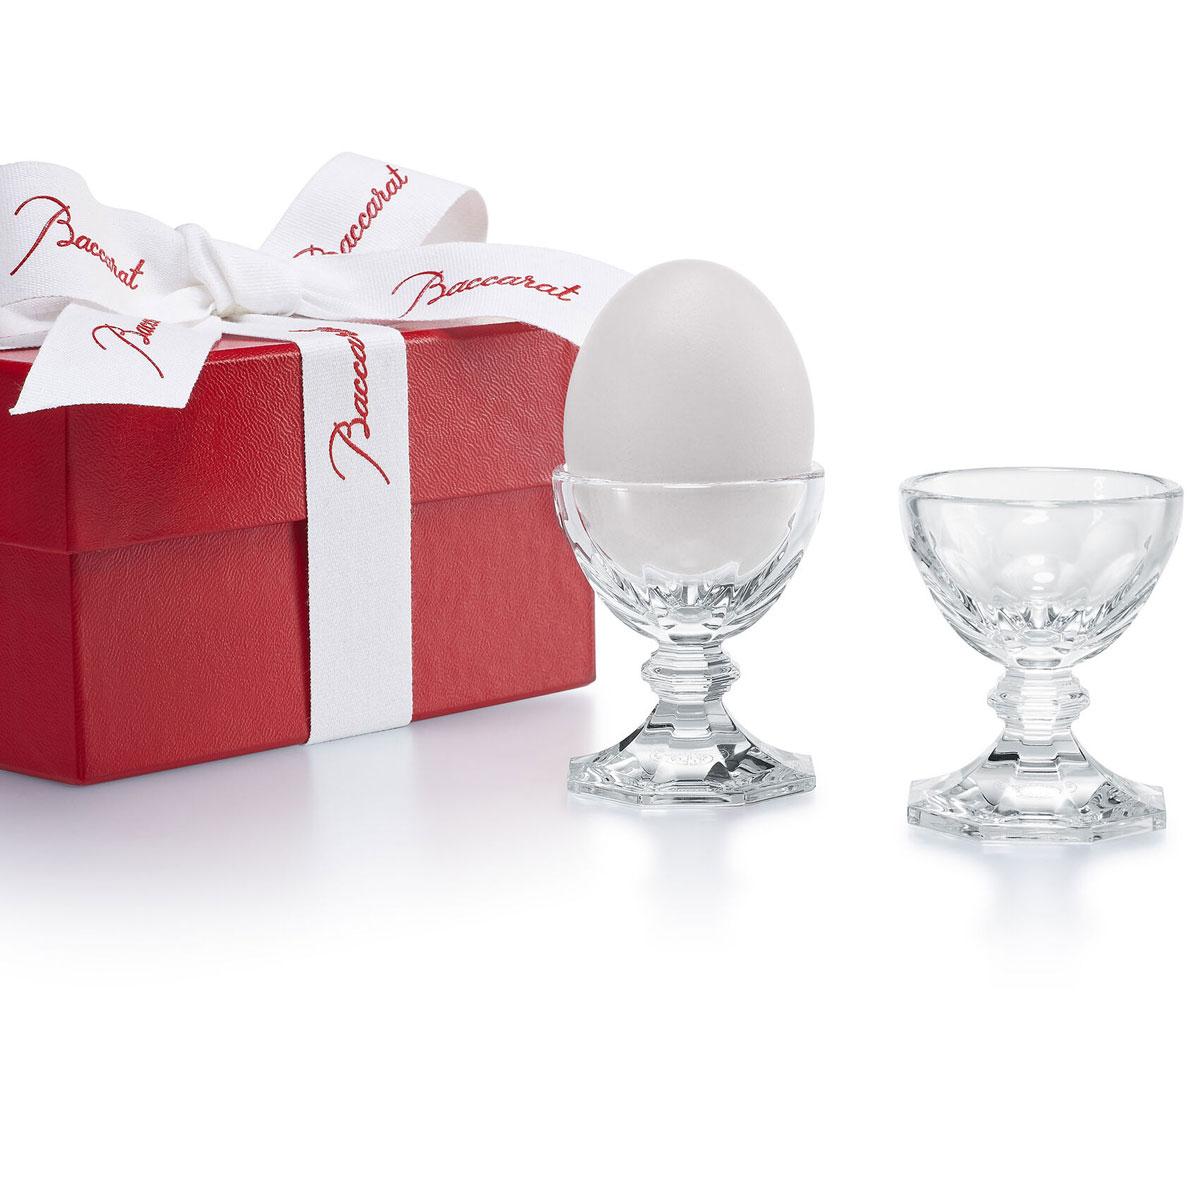 Baccarat Harcourt Egg Holder, Pair